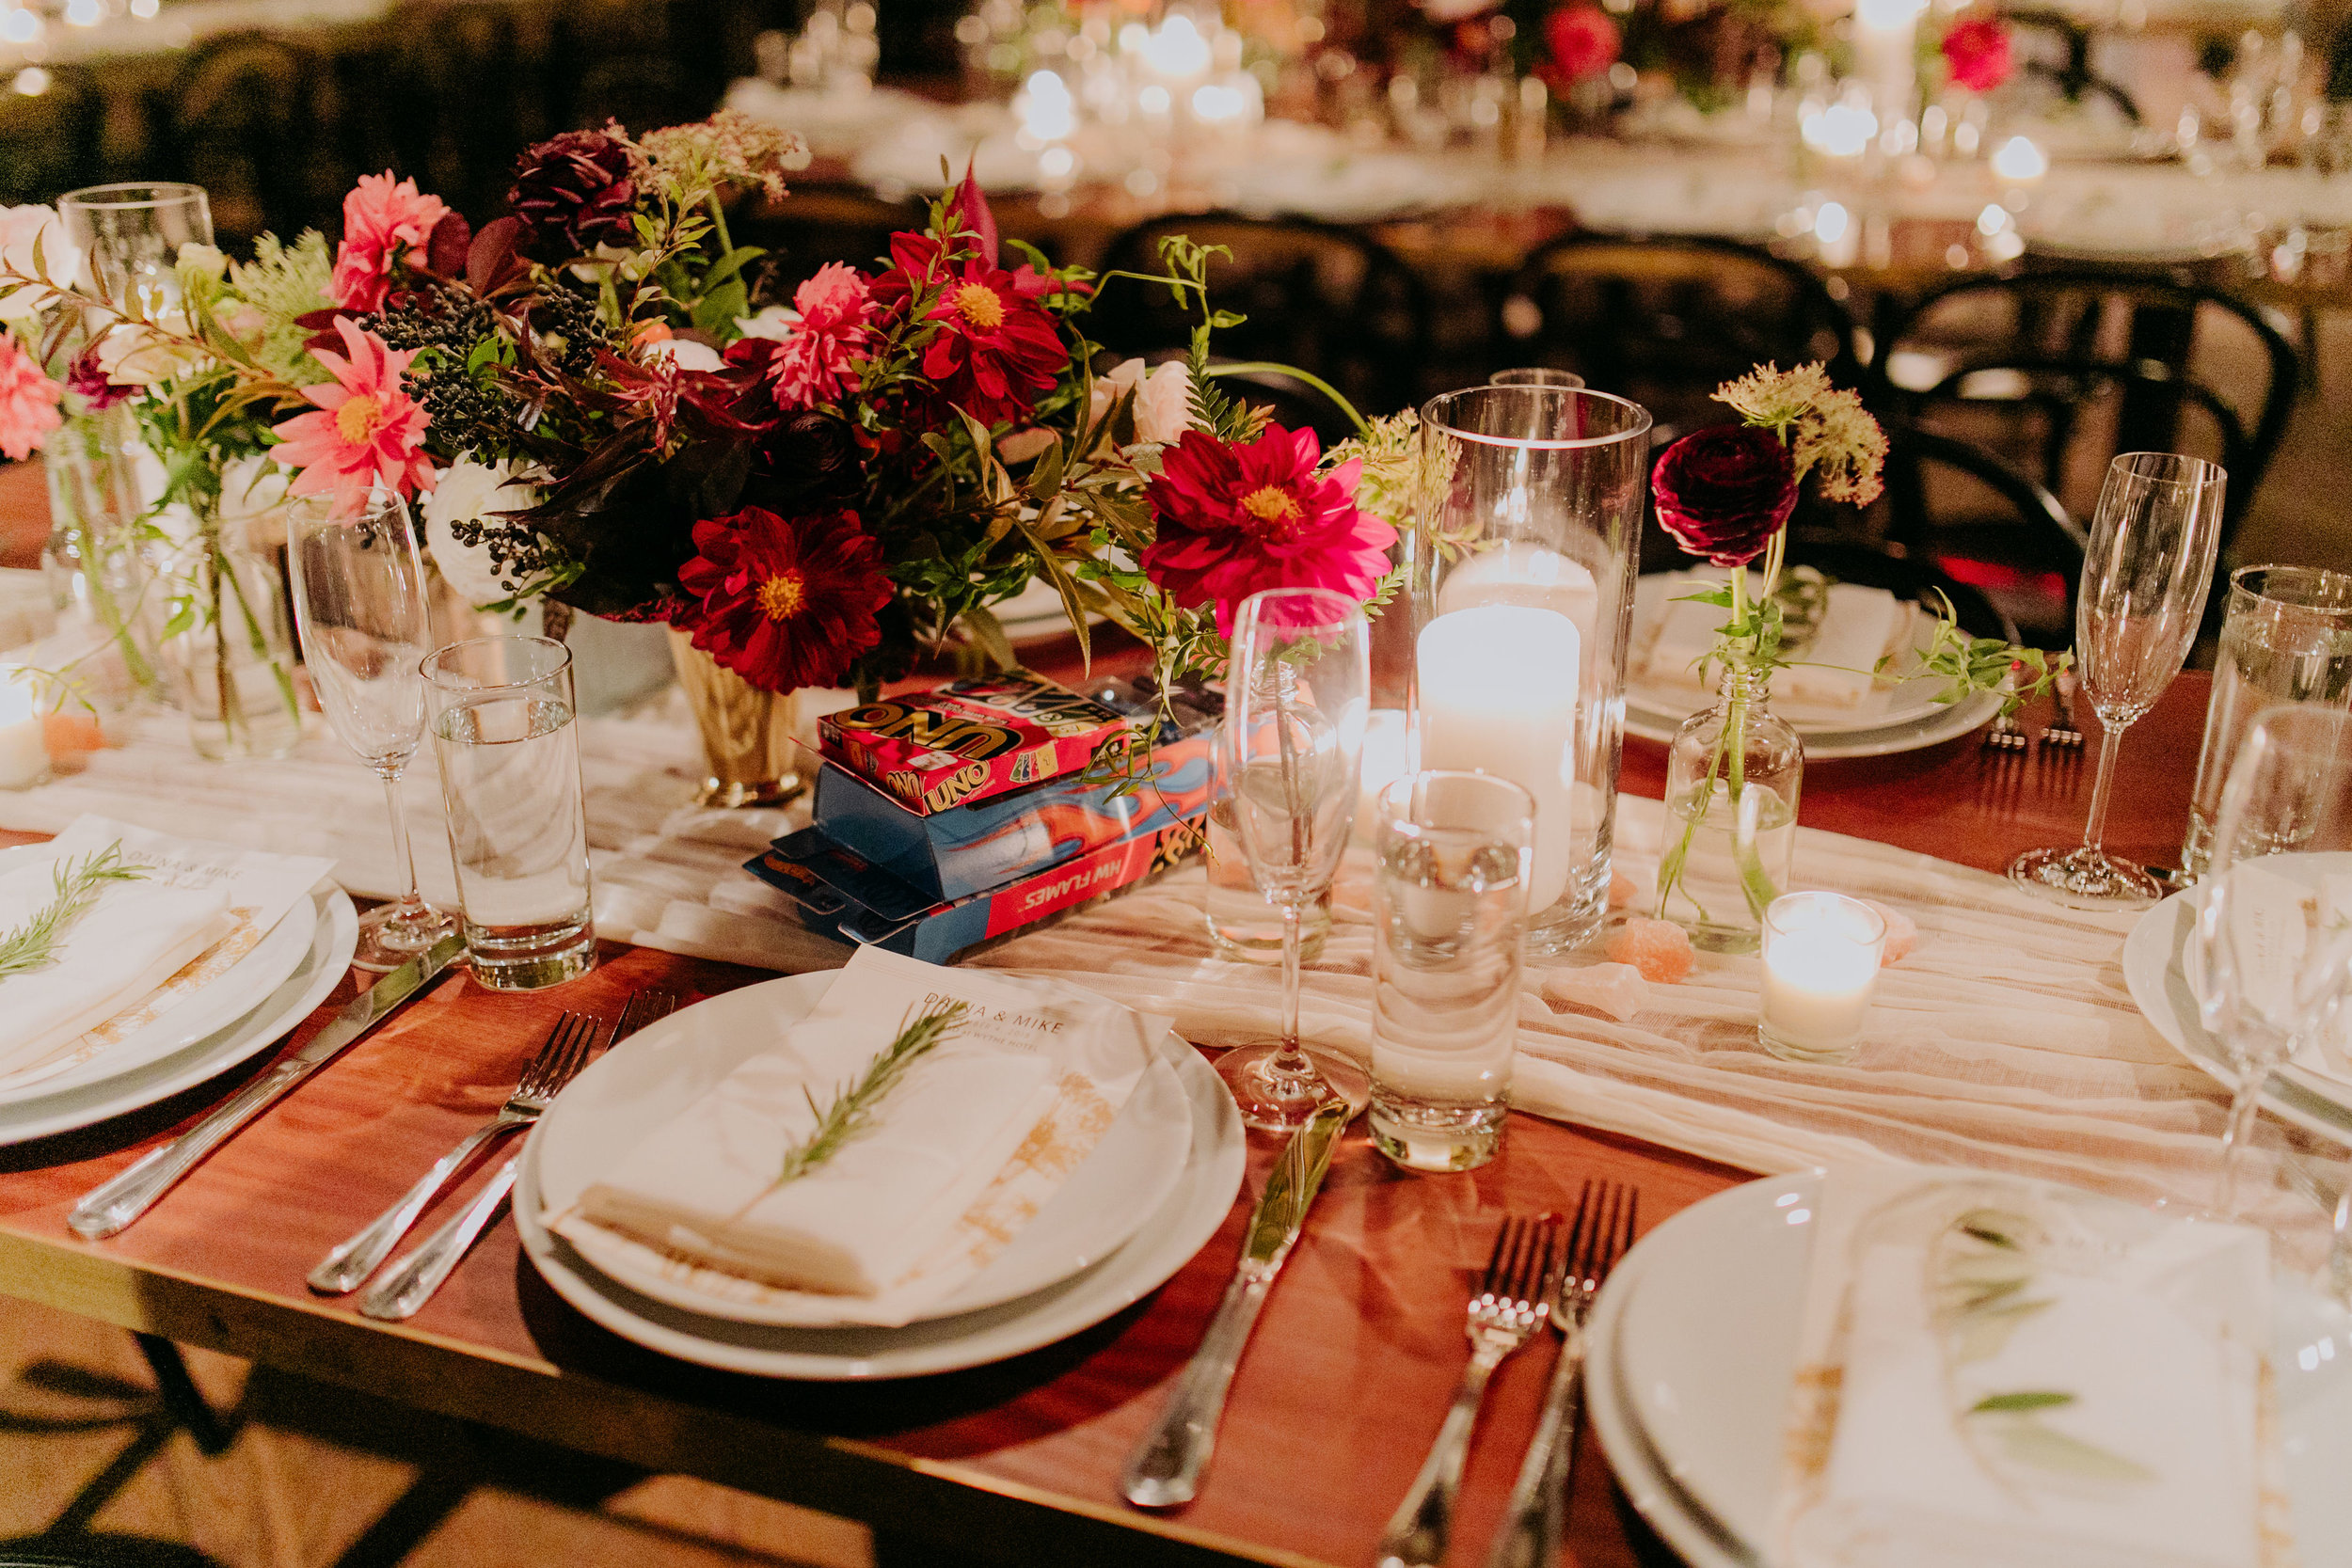 wythe-hotel-wedding-photographer-amber-gress-0446.jpg